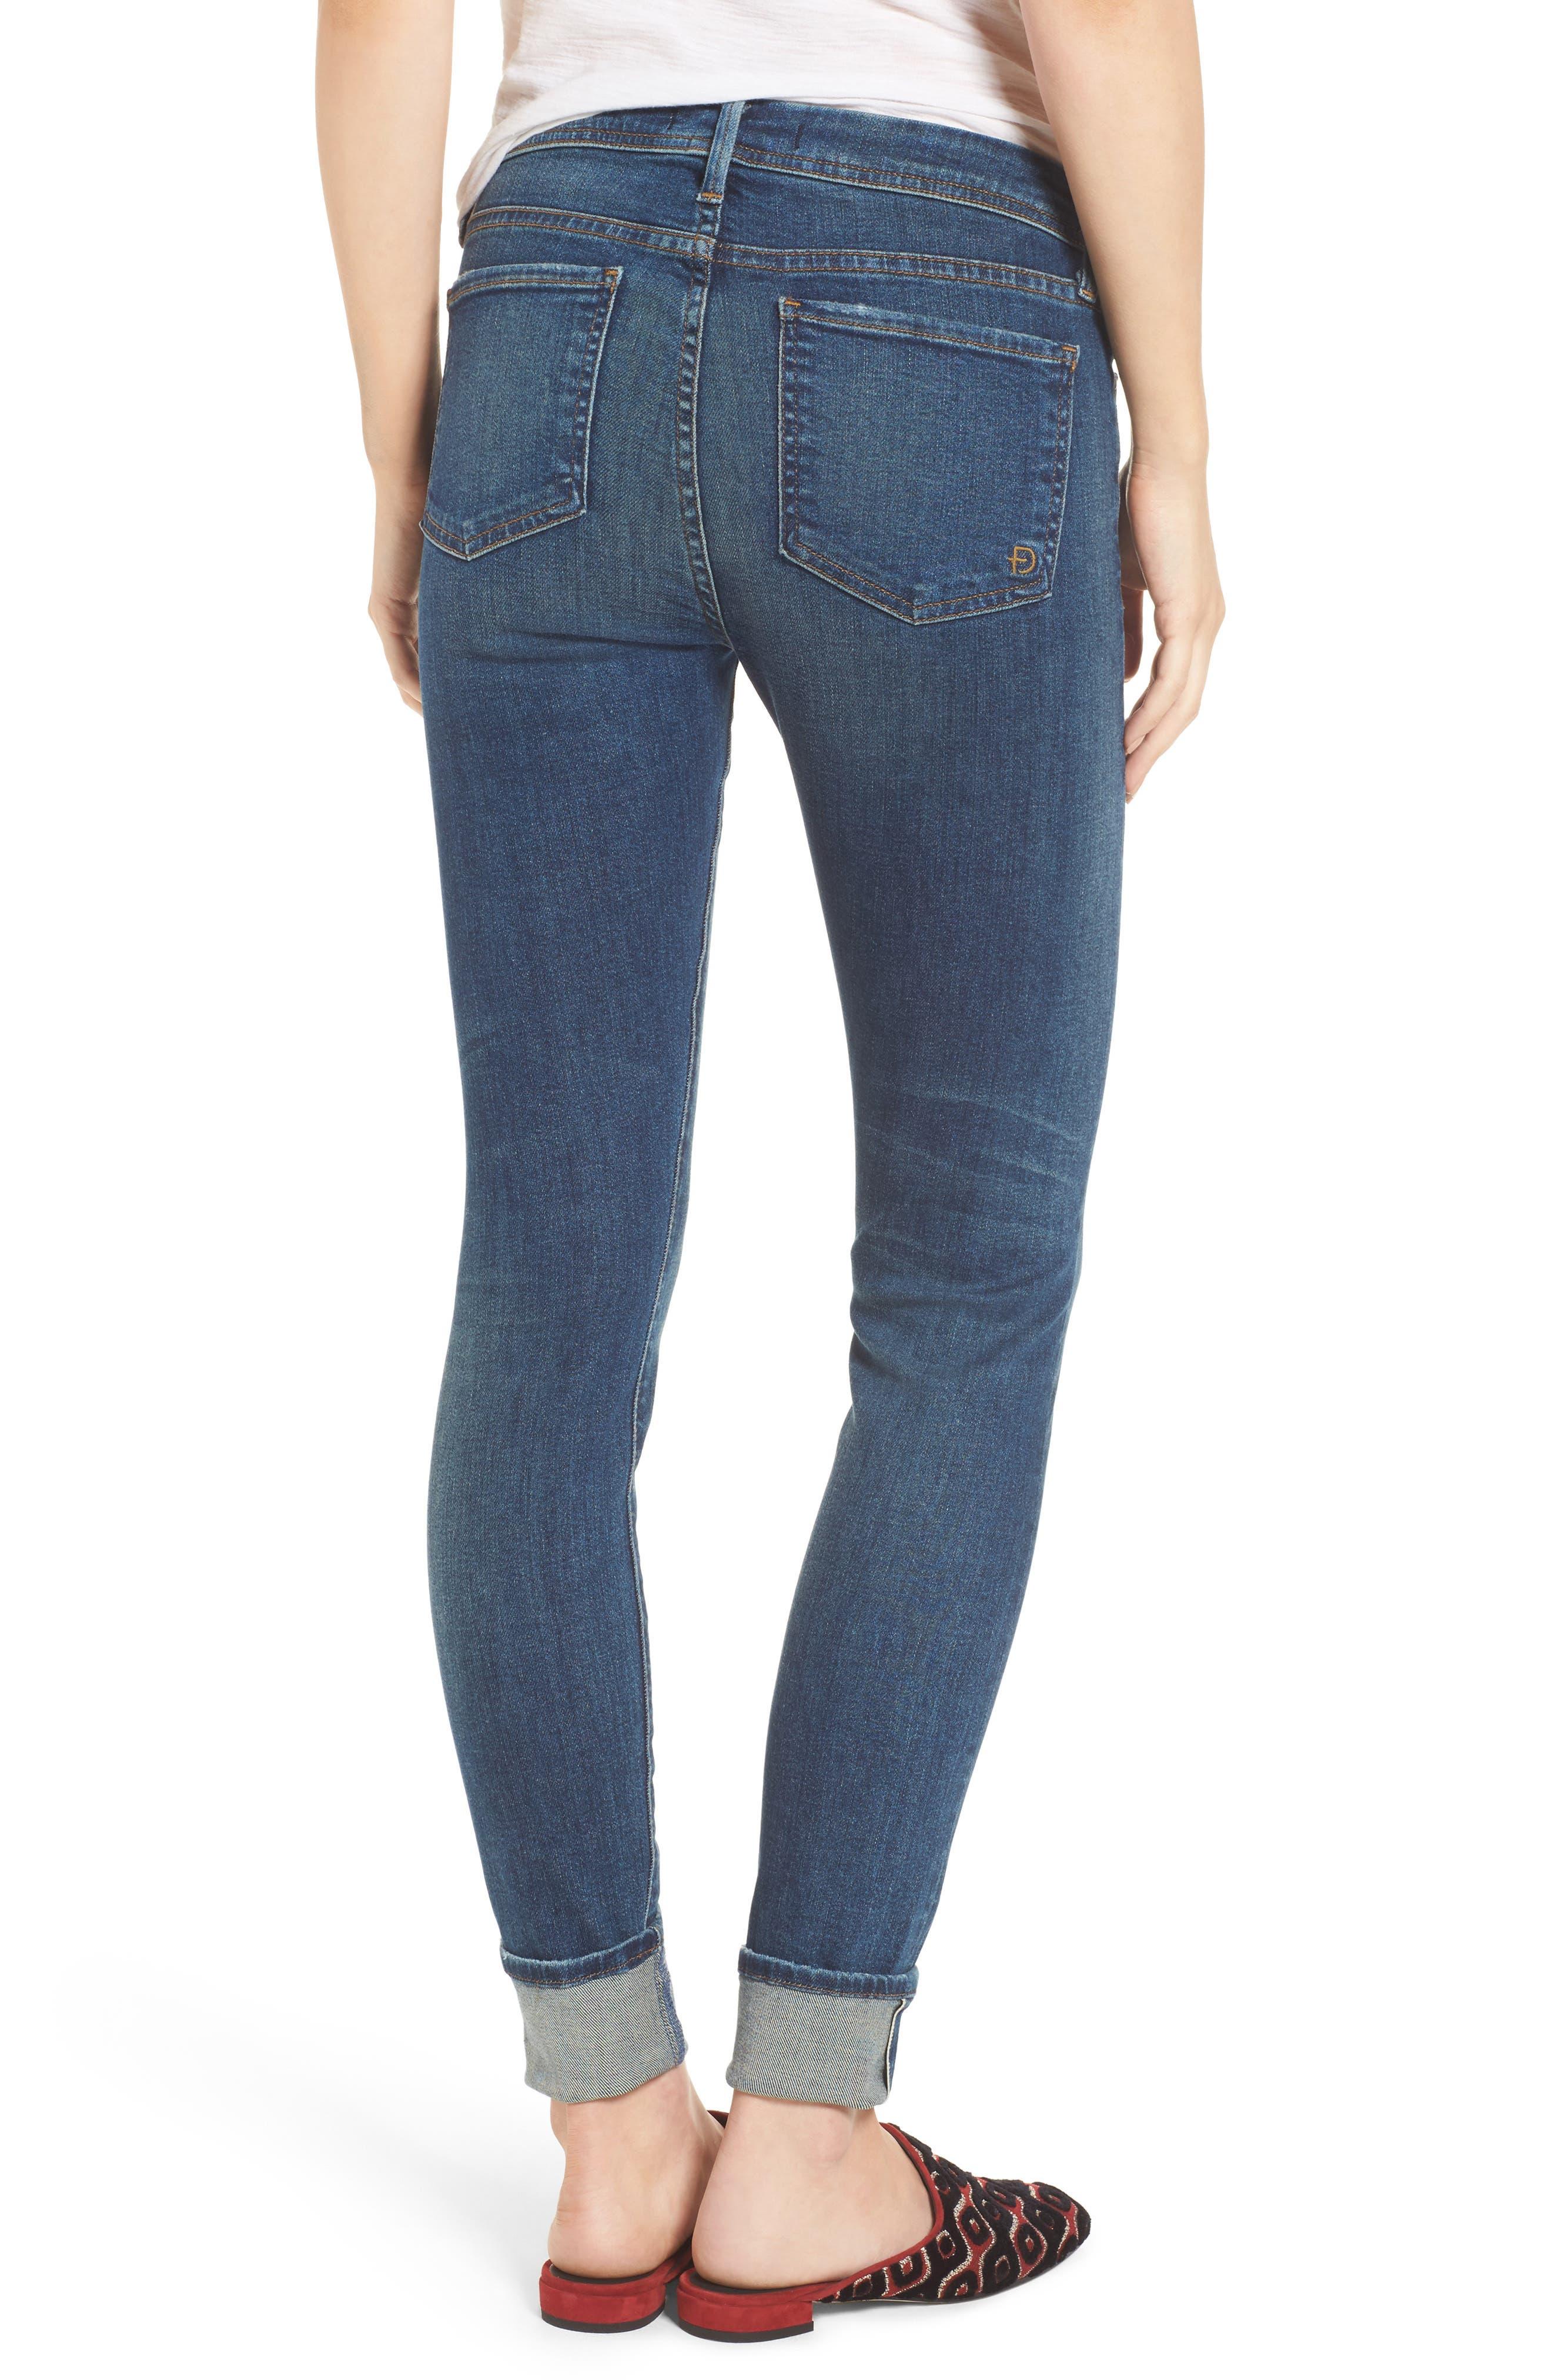 Belvedere Crop Skinny Jeans,                             Alternate thumbnail 2, color,